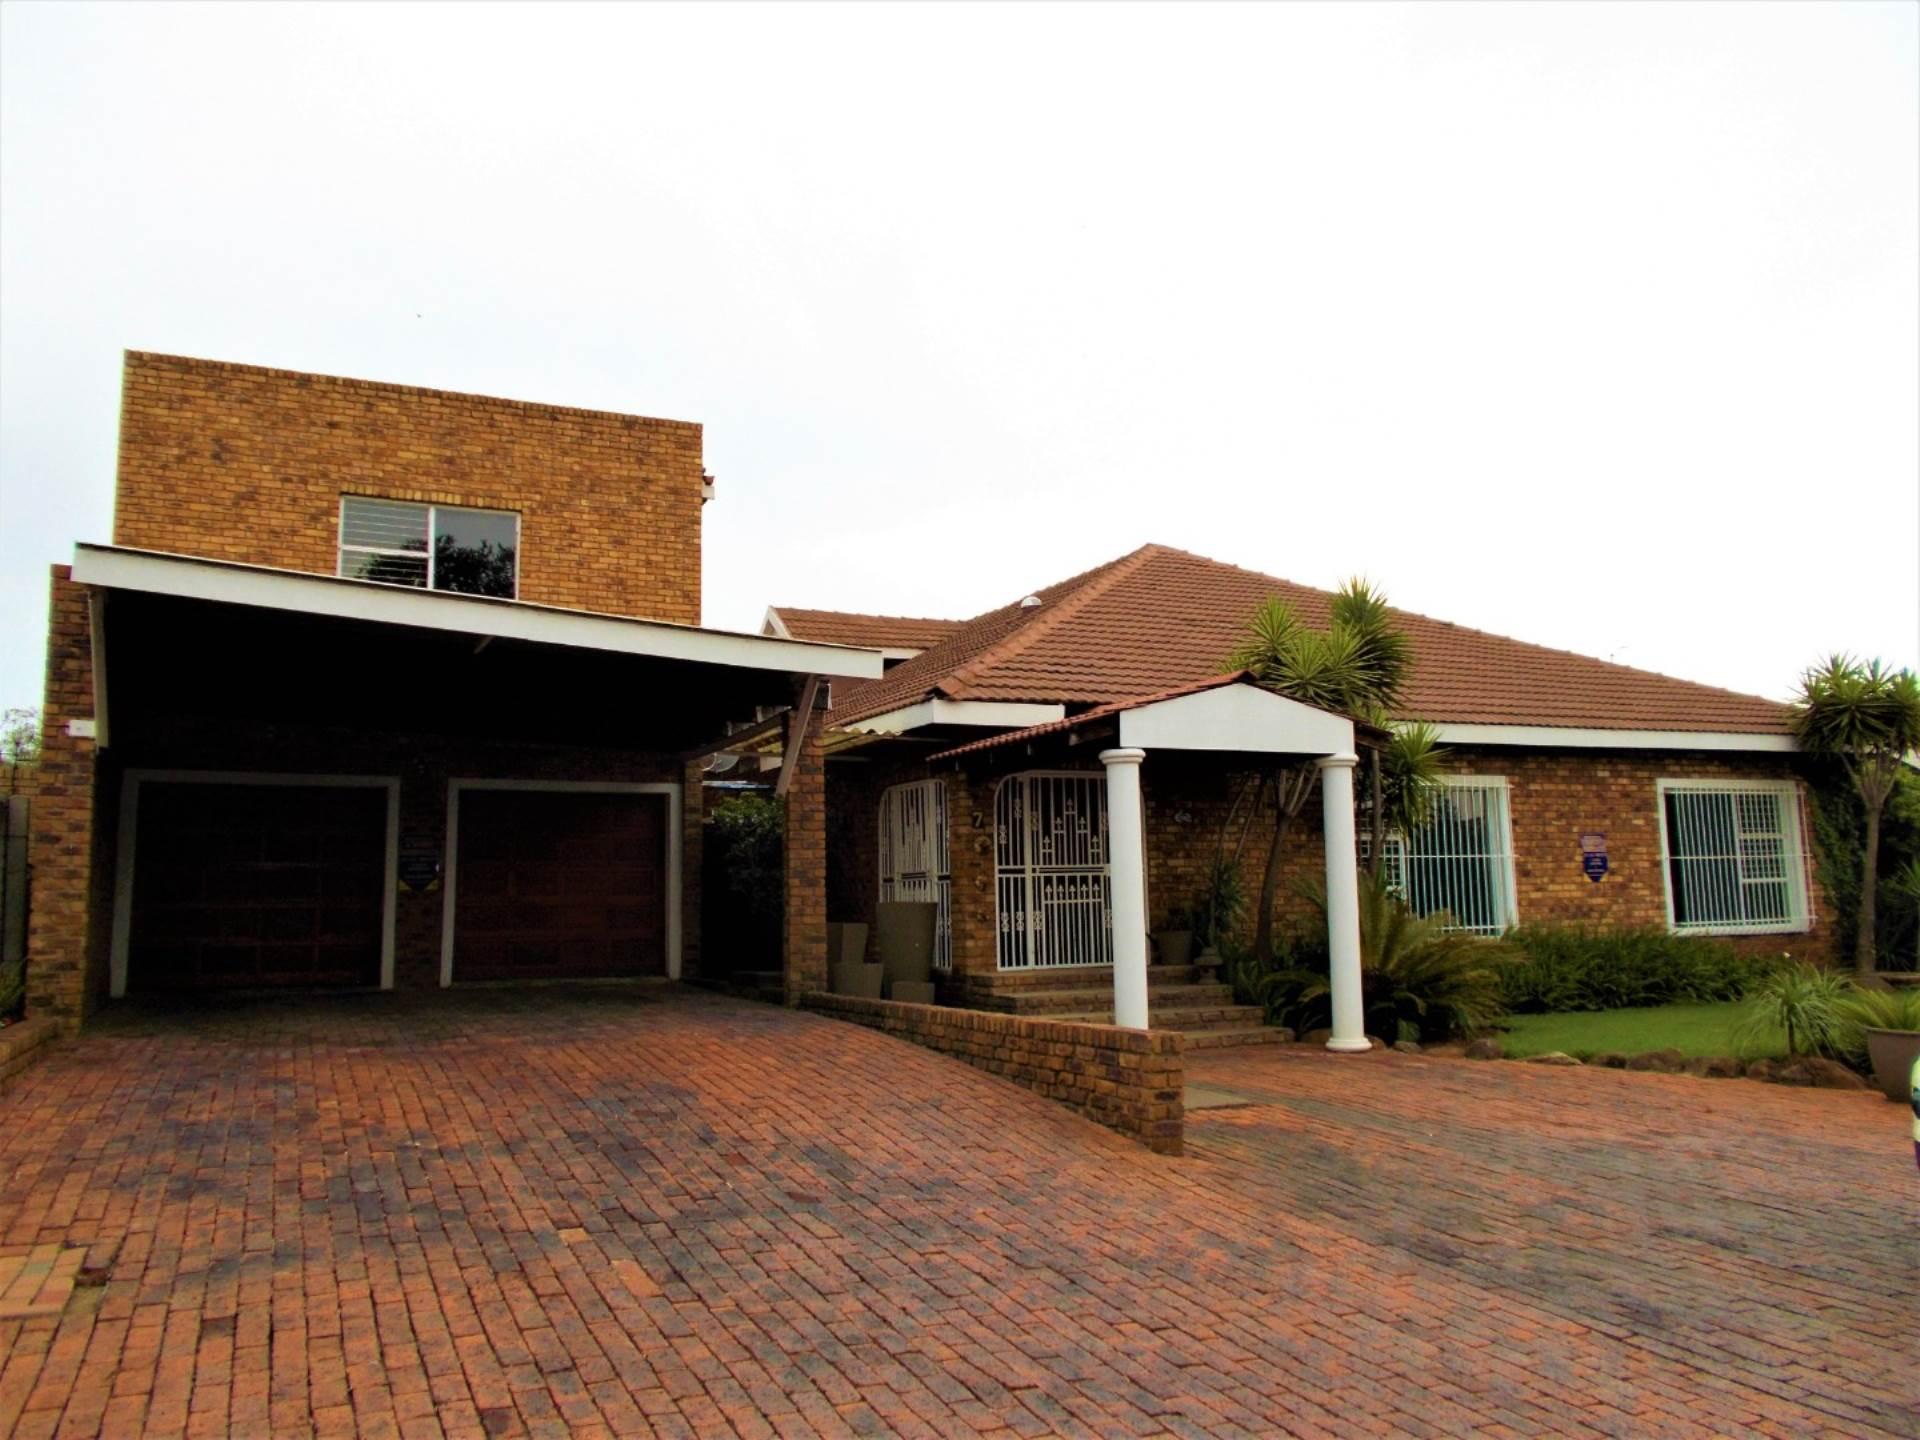 5 BedroomHouse For Sale In Petersfield